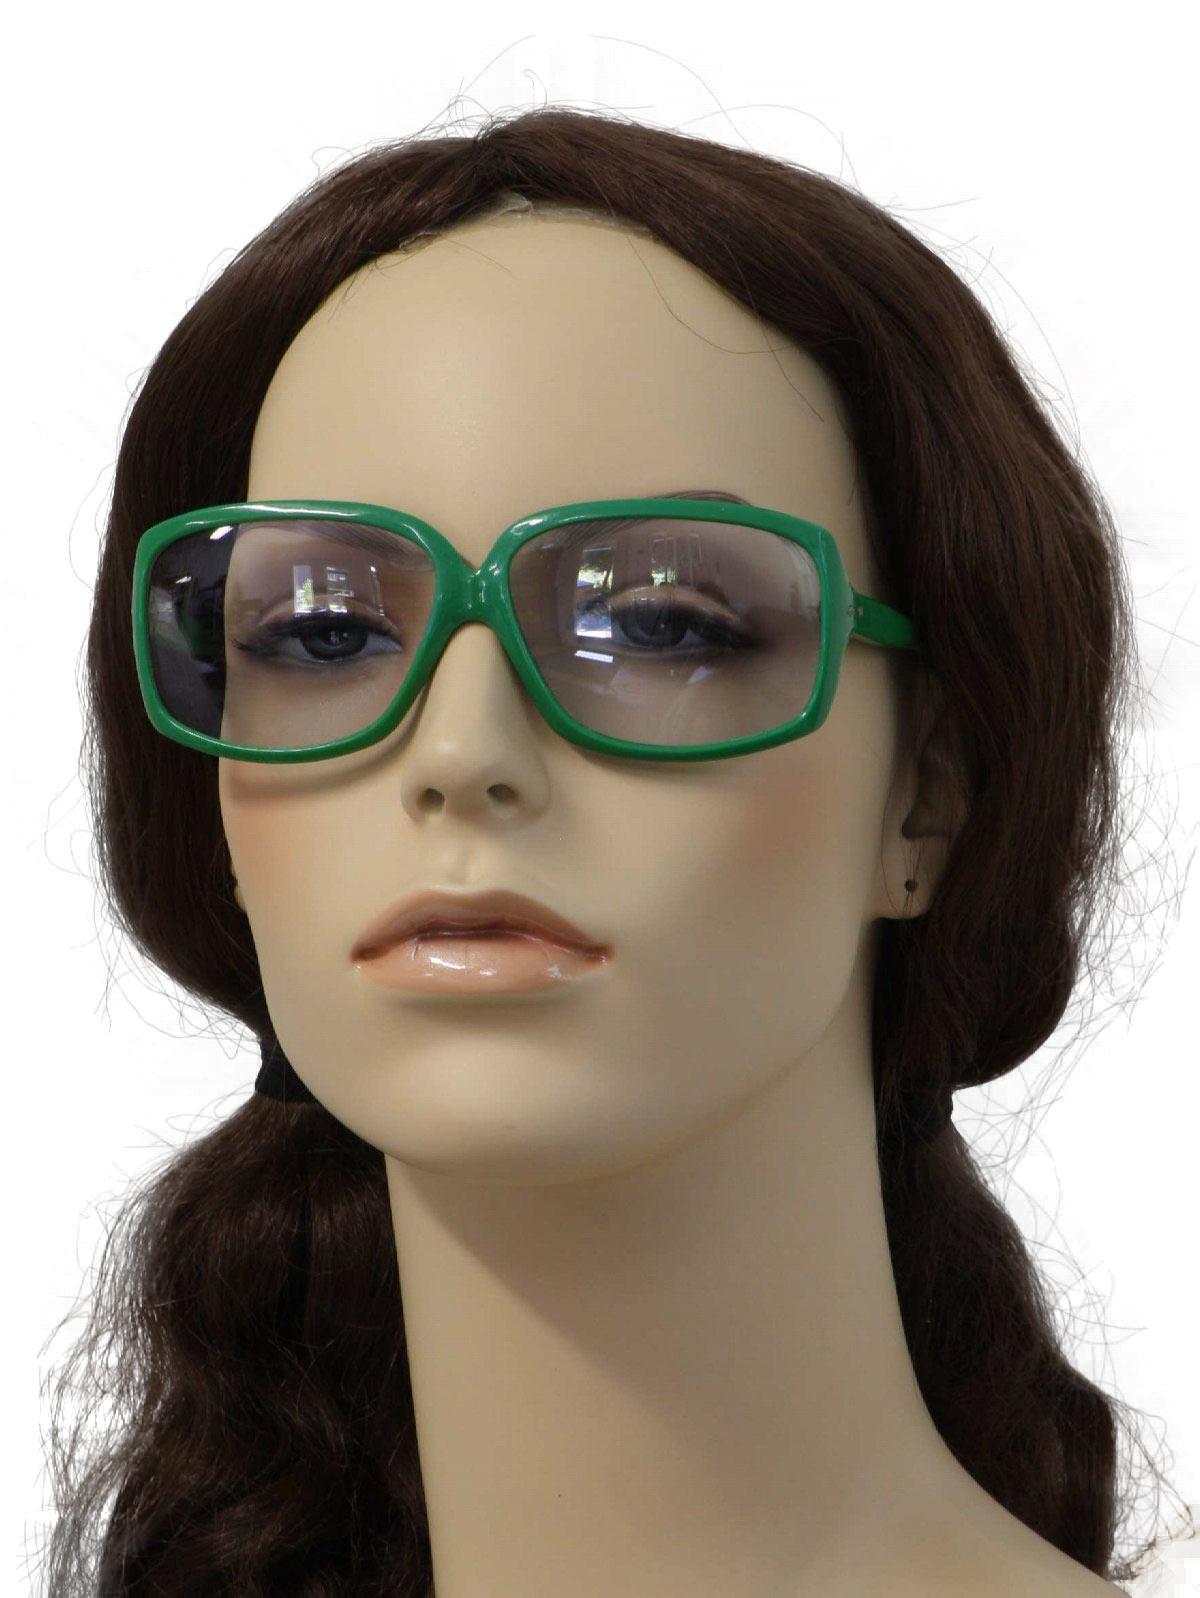 Kelly Green Eyeglass Frames : Oculens SunSensor 1970s Vintage Glasses: 1977 -Oculens ...